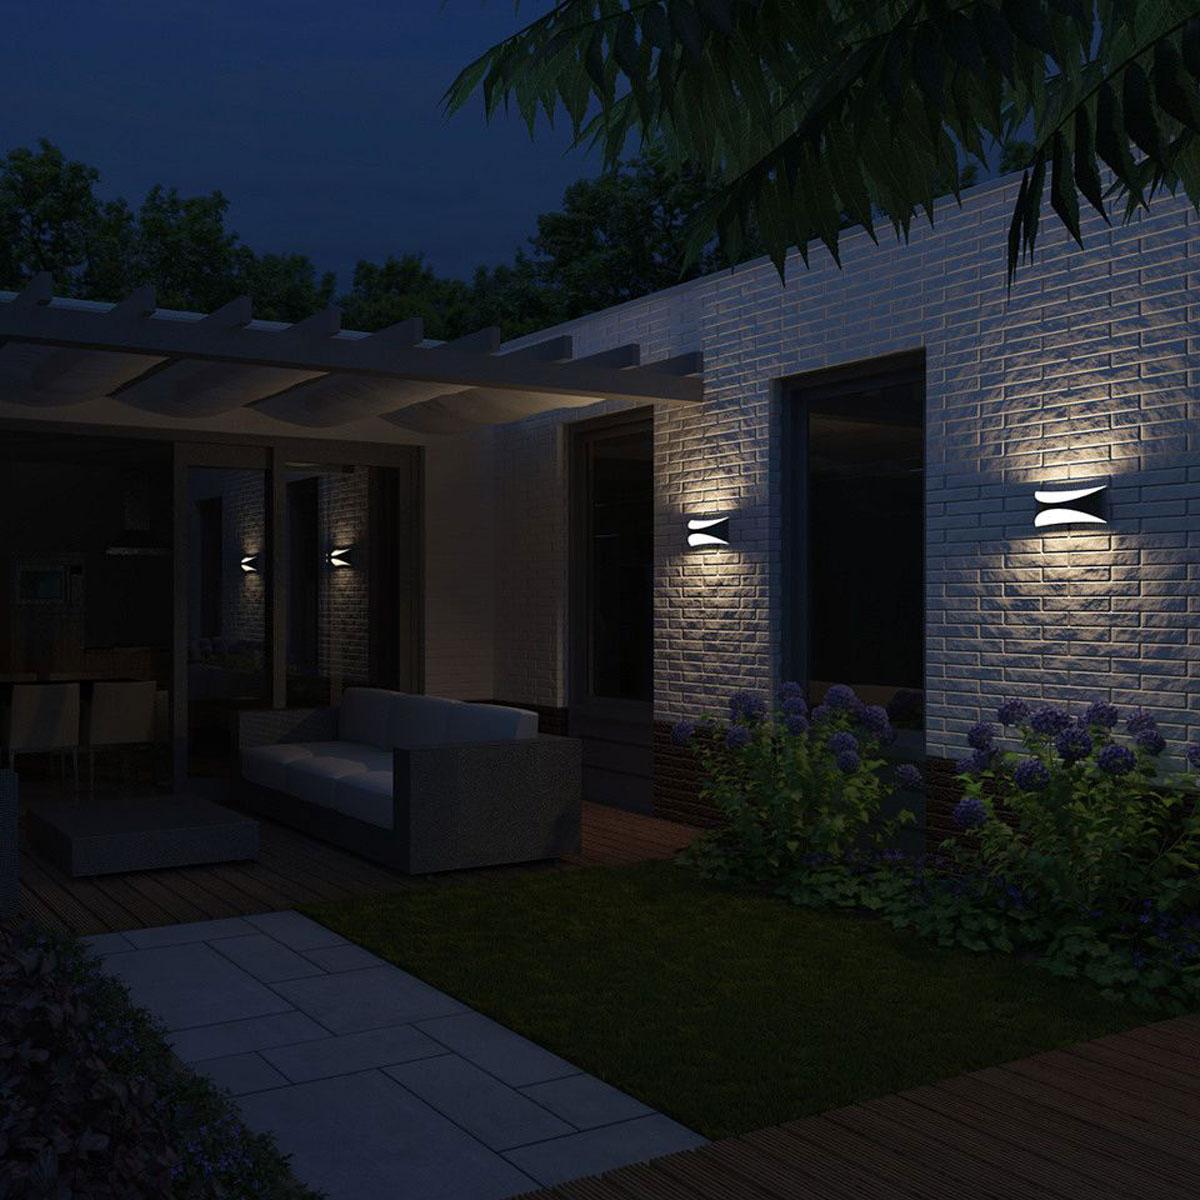 philips mygarden seedling wandlamp rvs wit. Black Bedroom Furniture Sets. Home Design Ideas